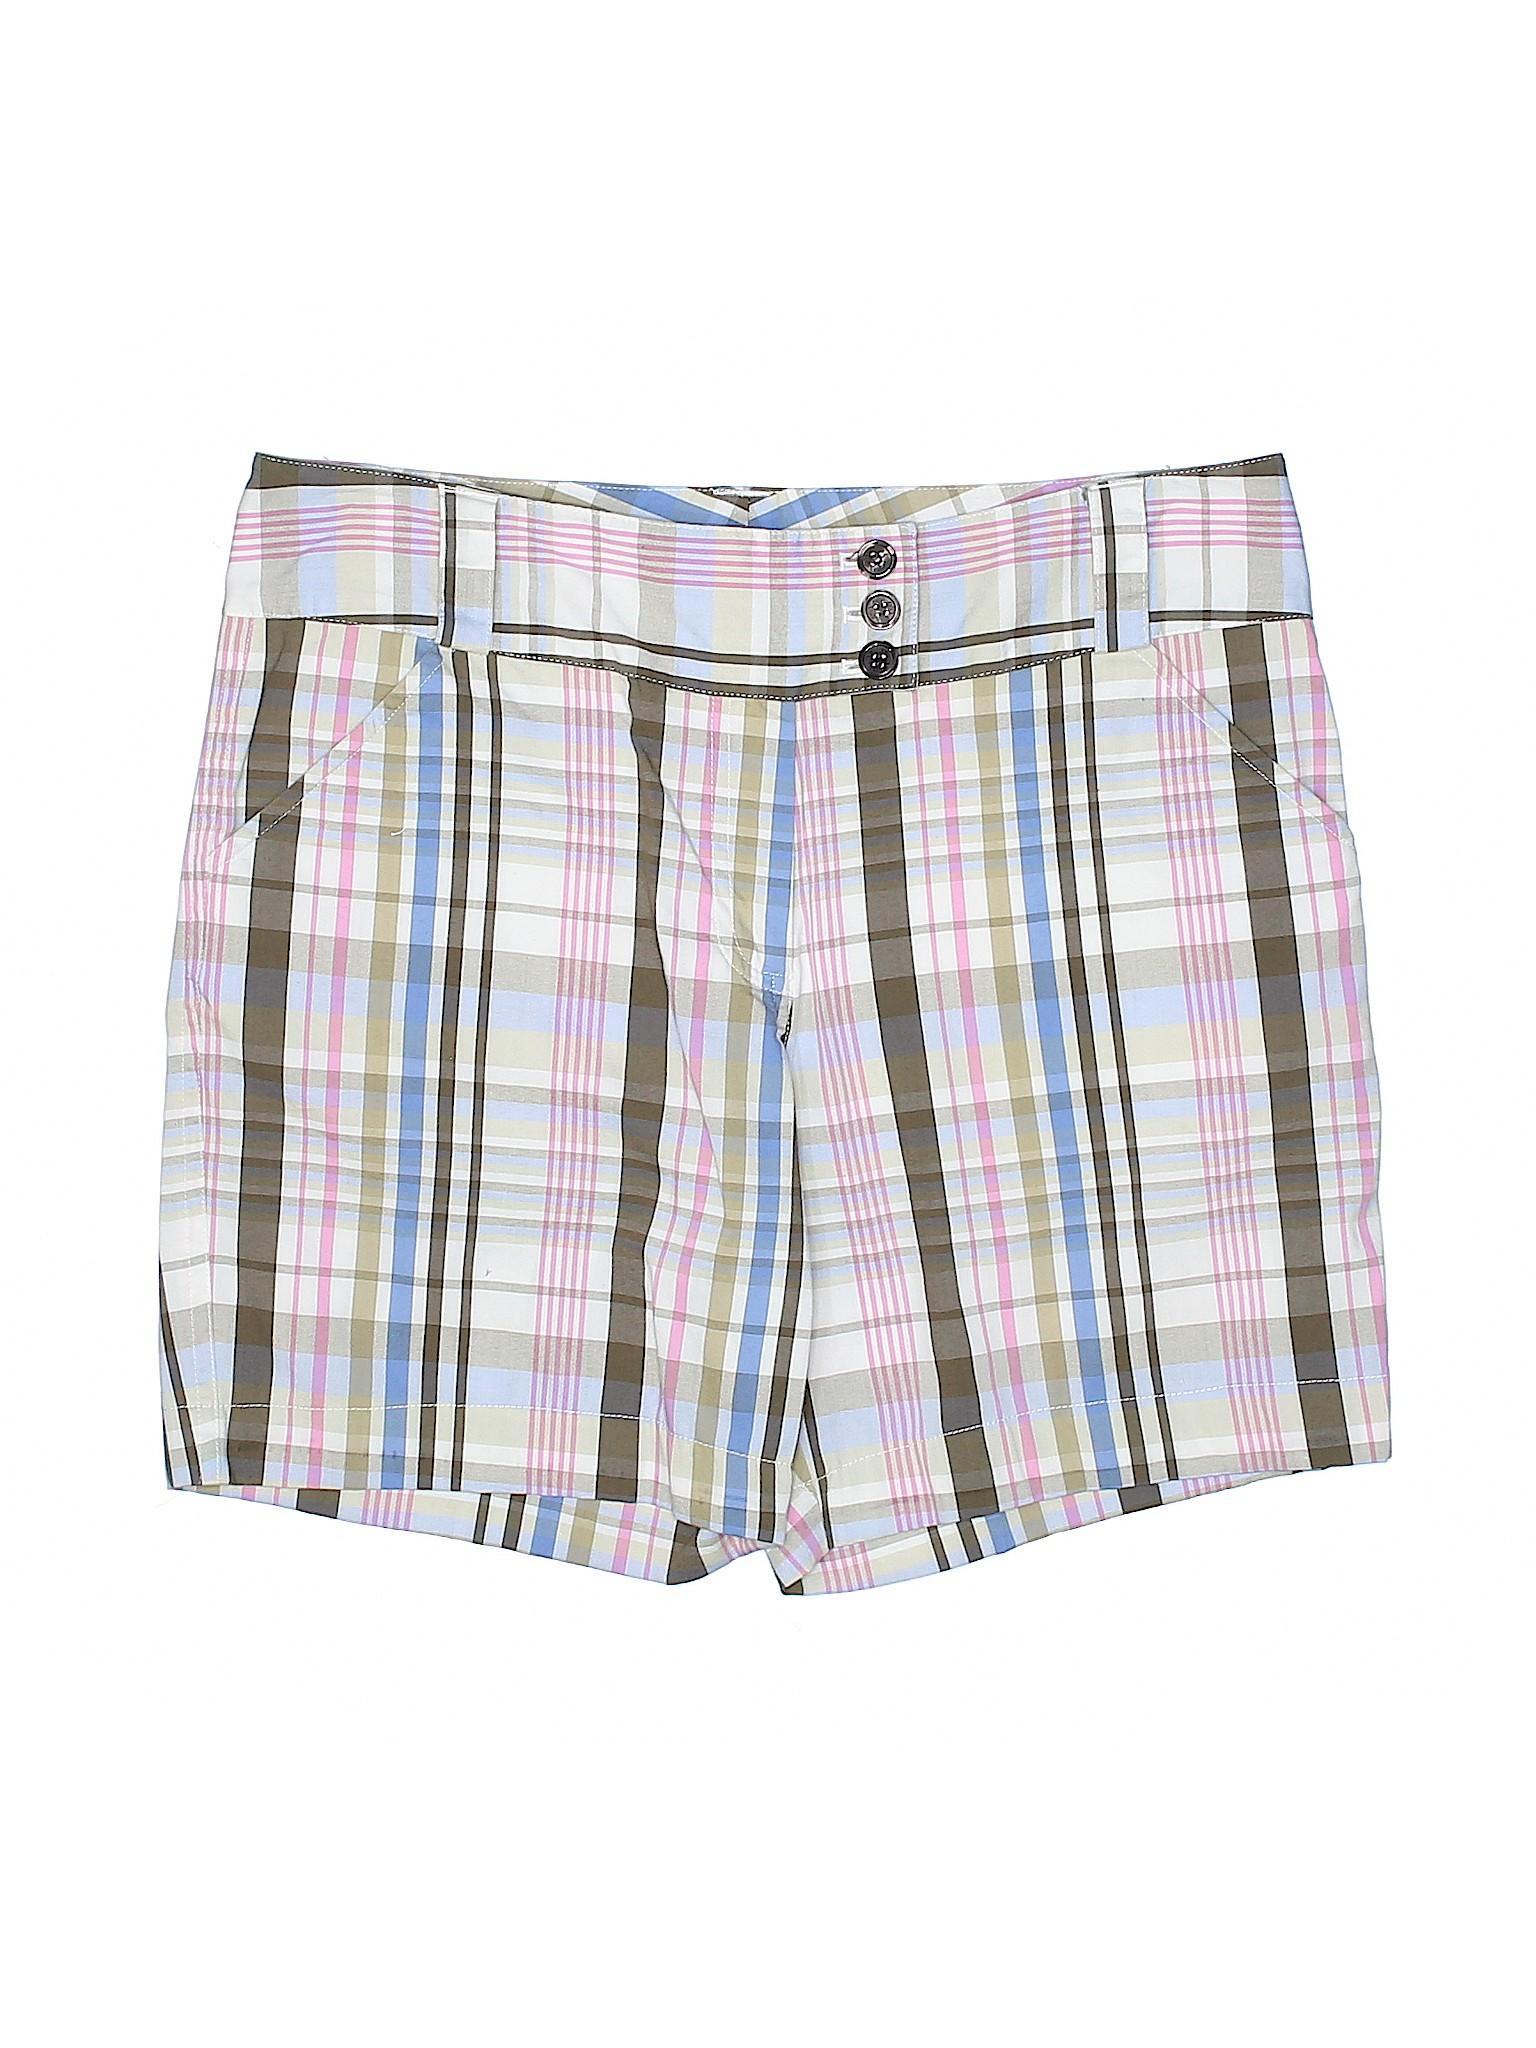 Lija Lija Shorts Lija Shorts Shorts Boutique Boutique Boutique Boutique wEdq80y0